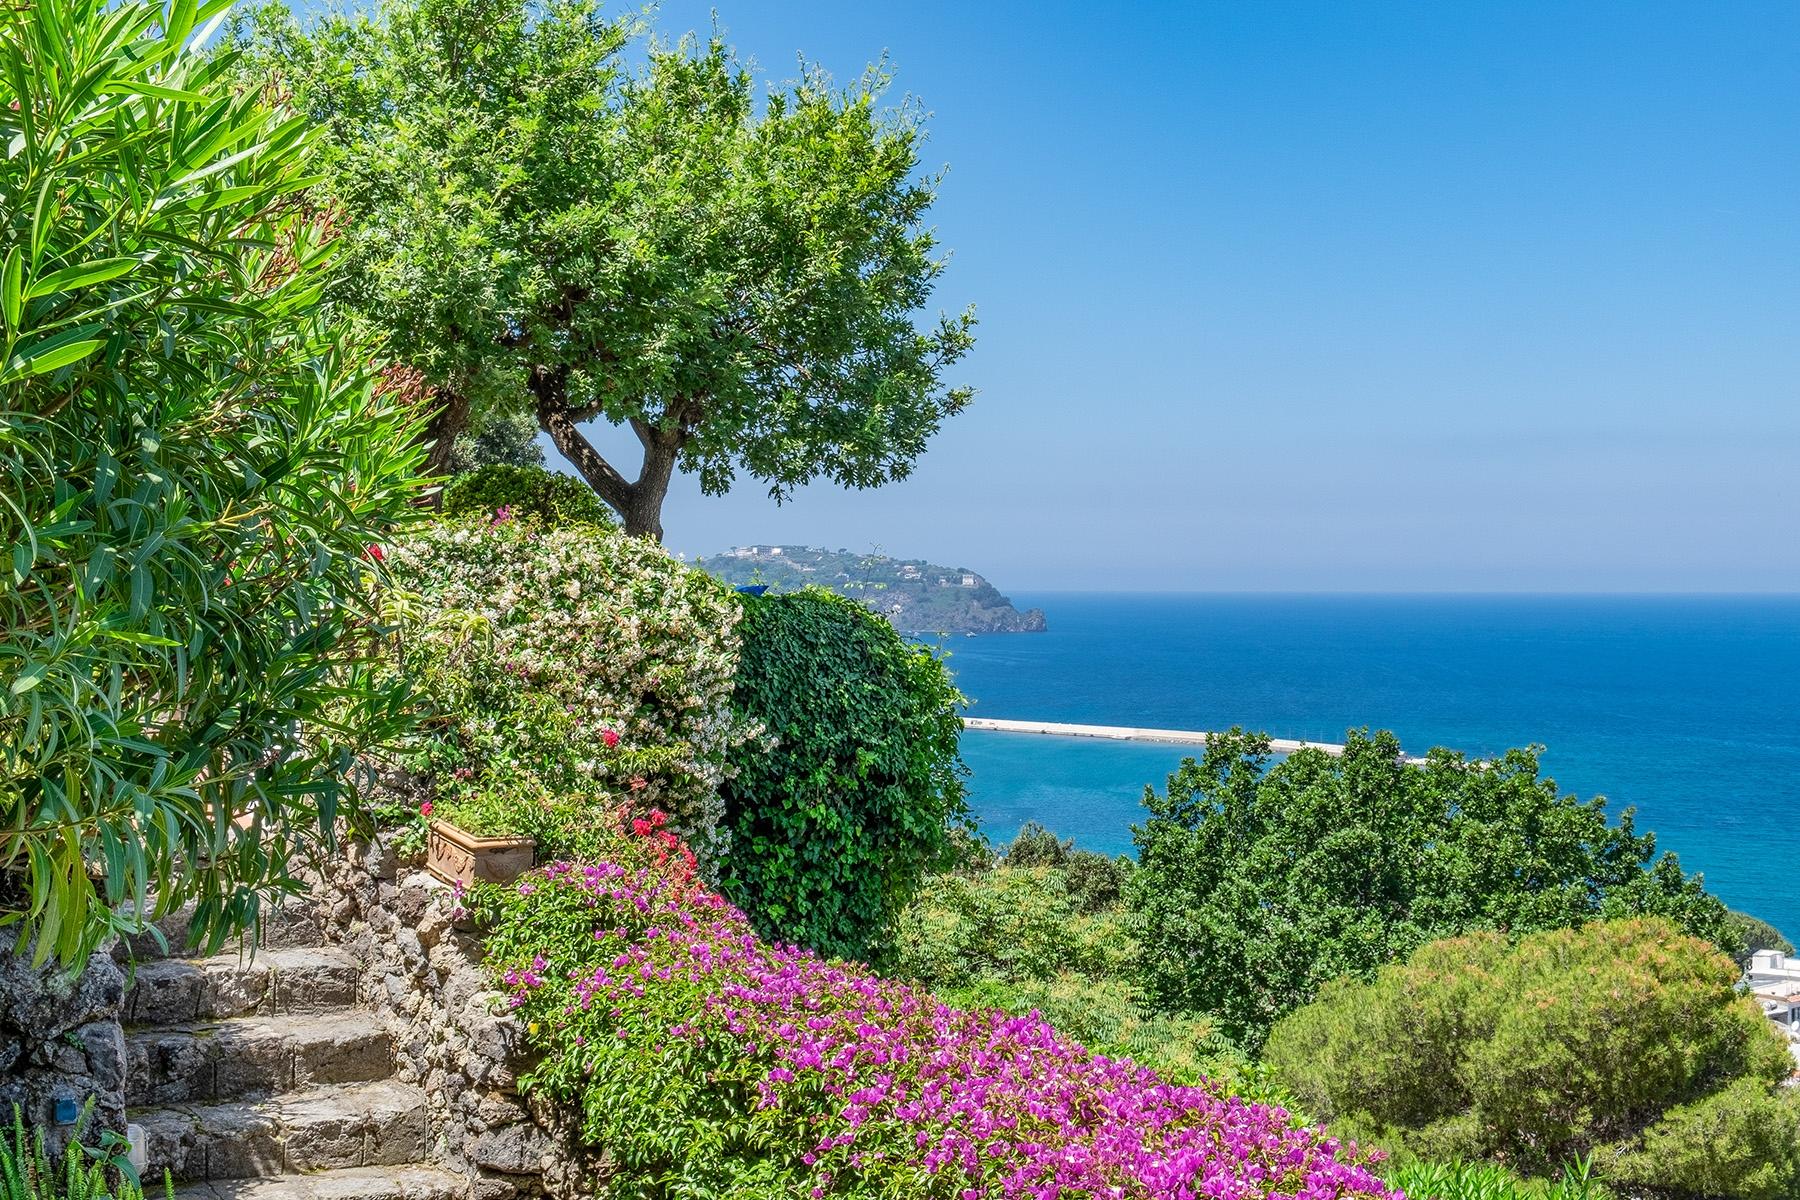 Villa in Vendita a Ischia: 5 locali, 206 mq - Foto 17